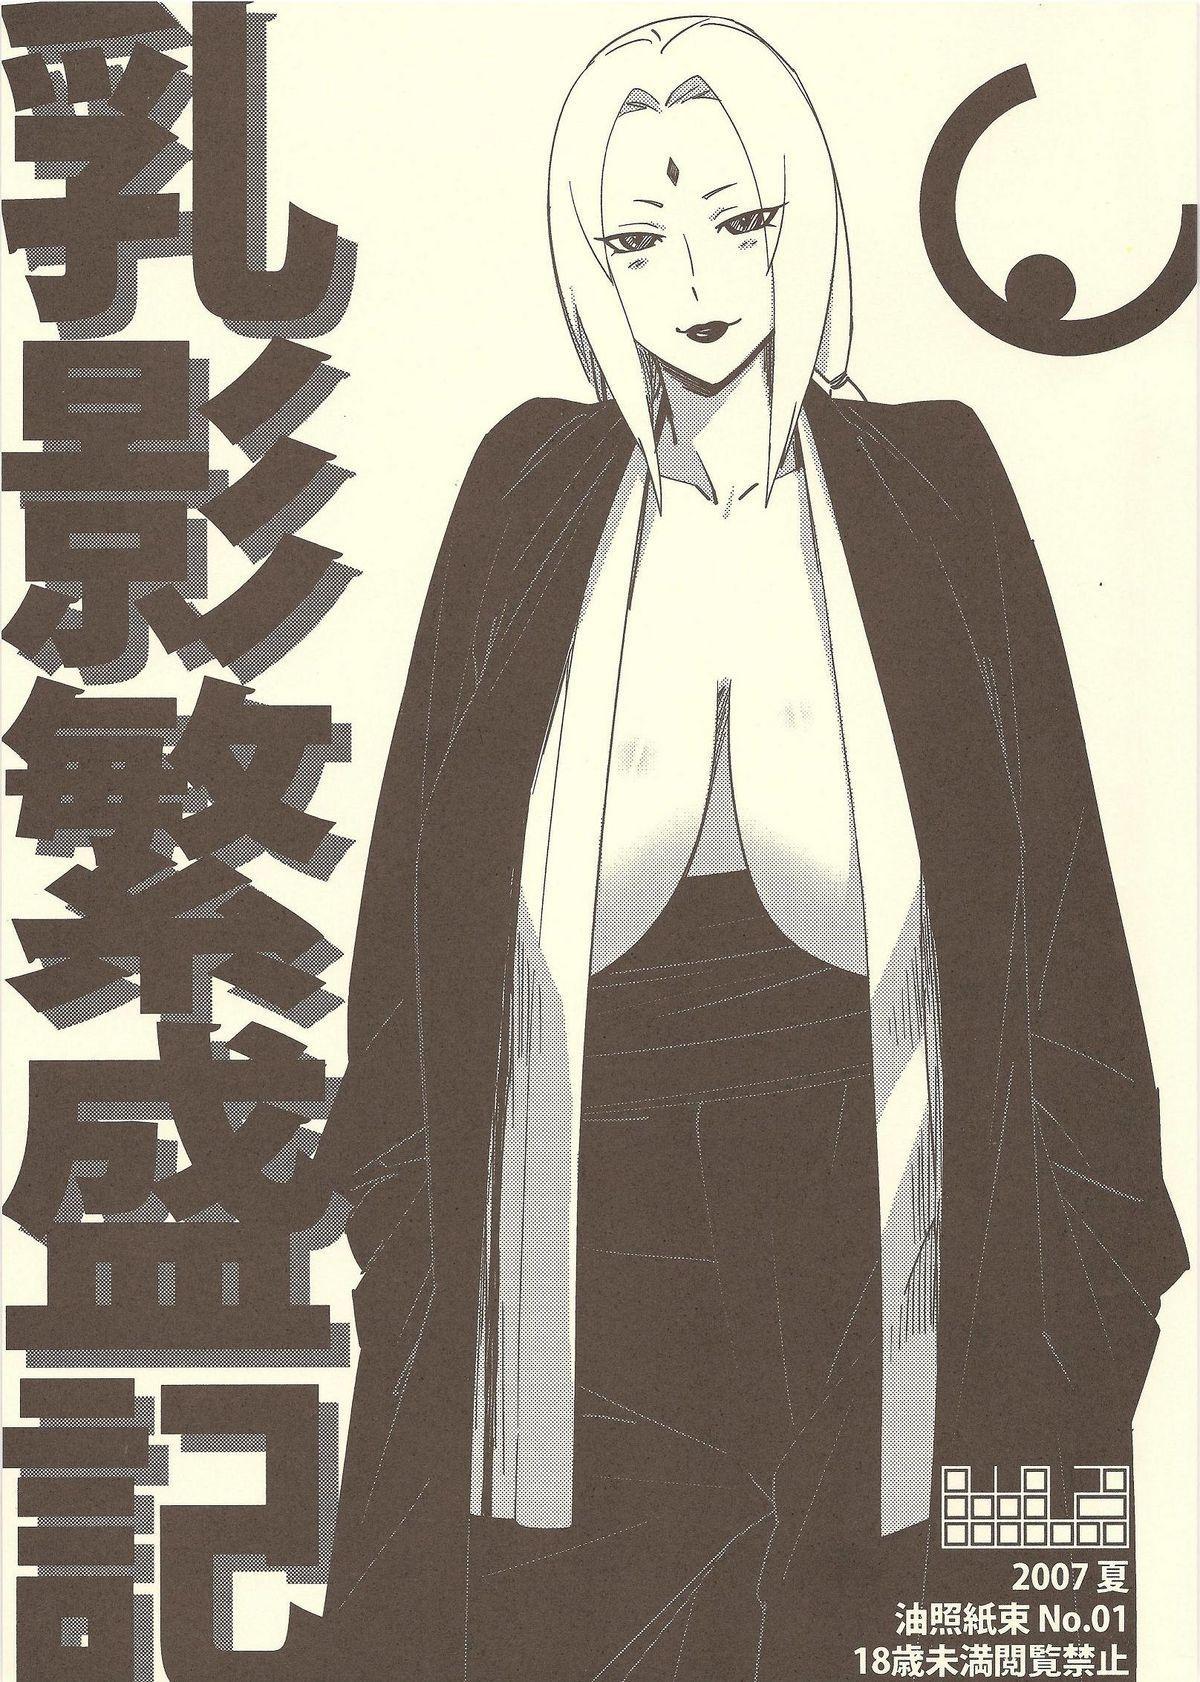 AbRAdEli kAMiTAbA No. 01 Chichikage Hanjouki 0